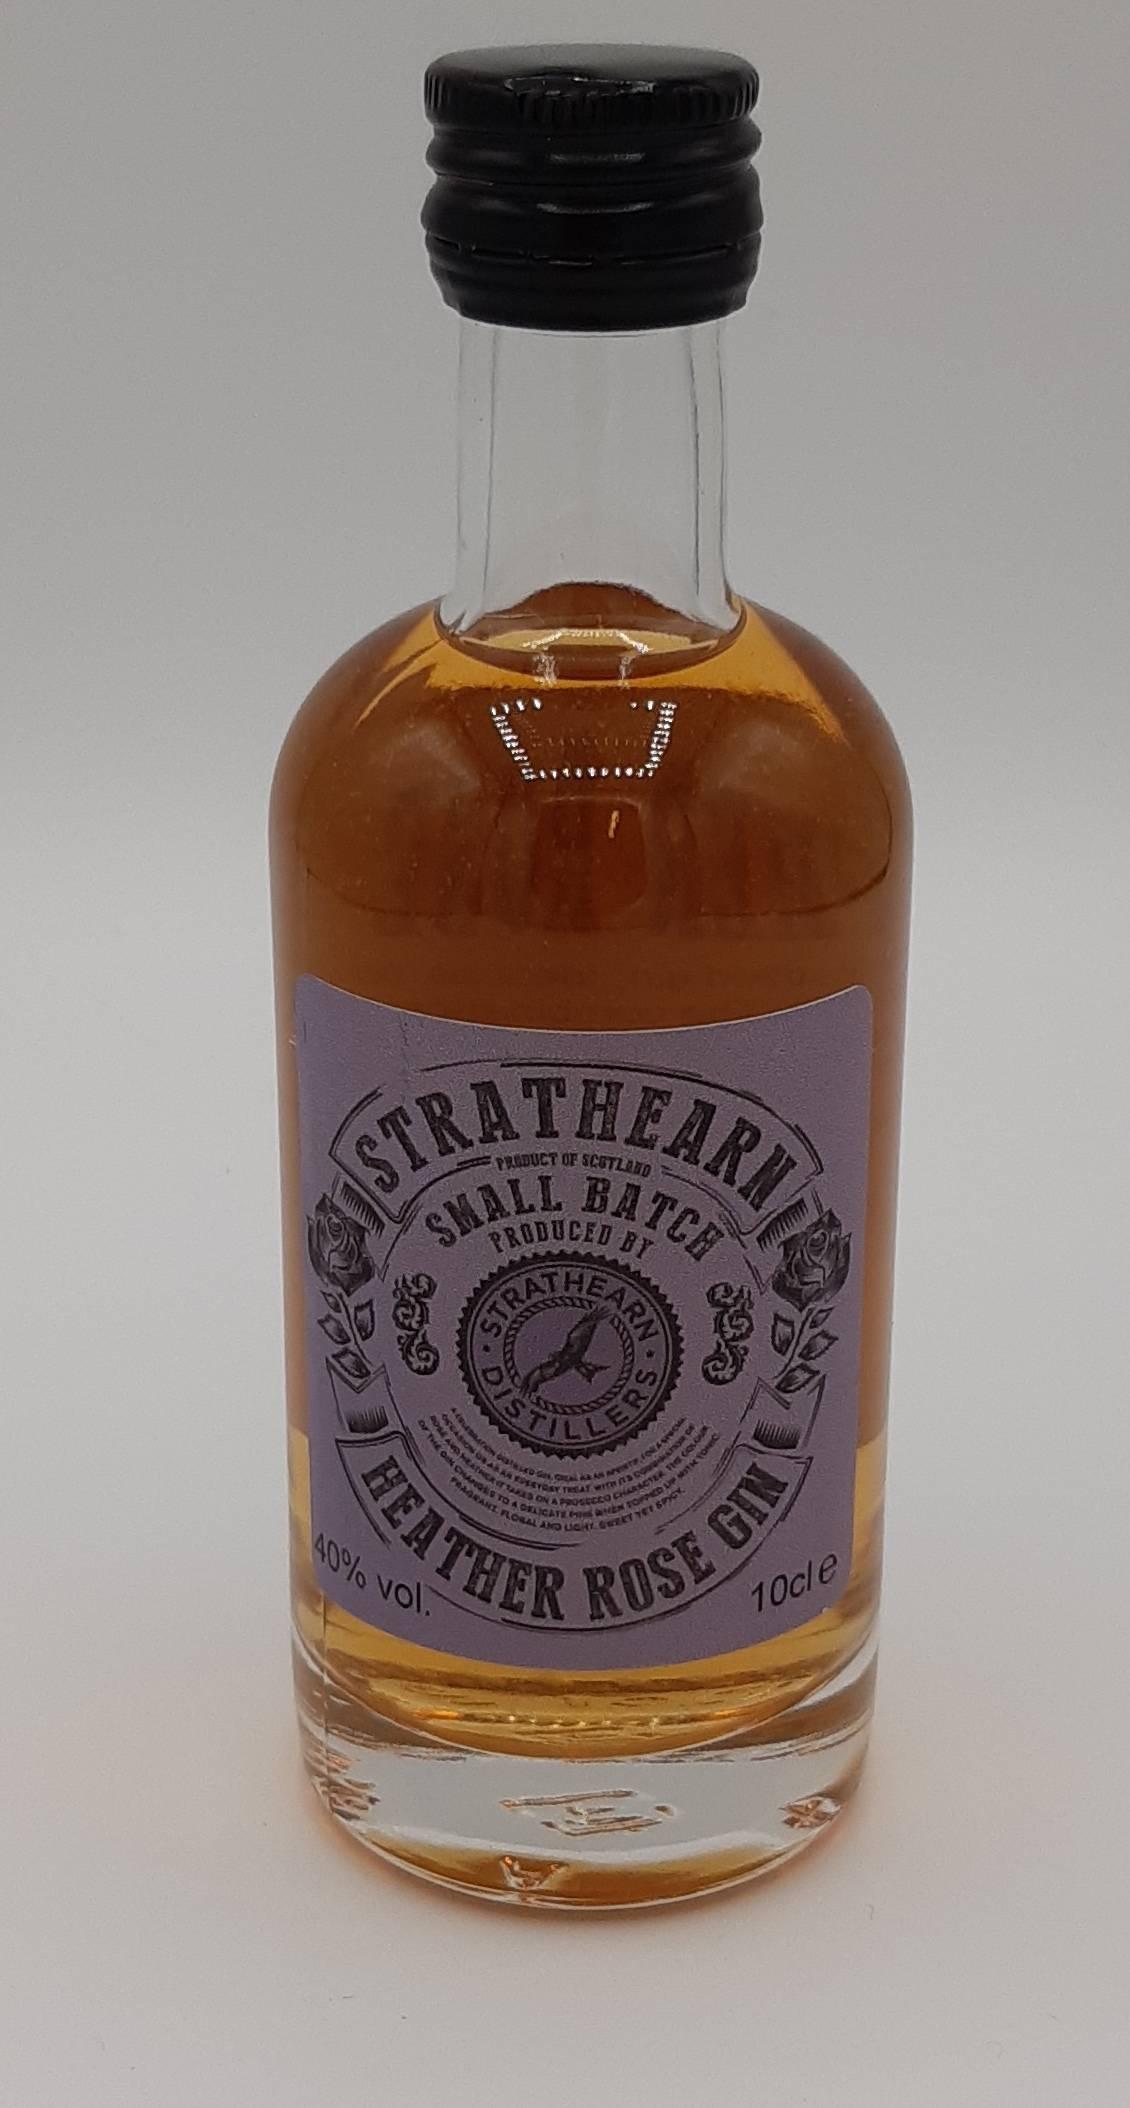 Strathearn Heather Rose Gin Gins & Gin Liqueurs